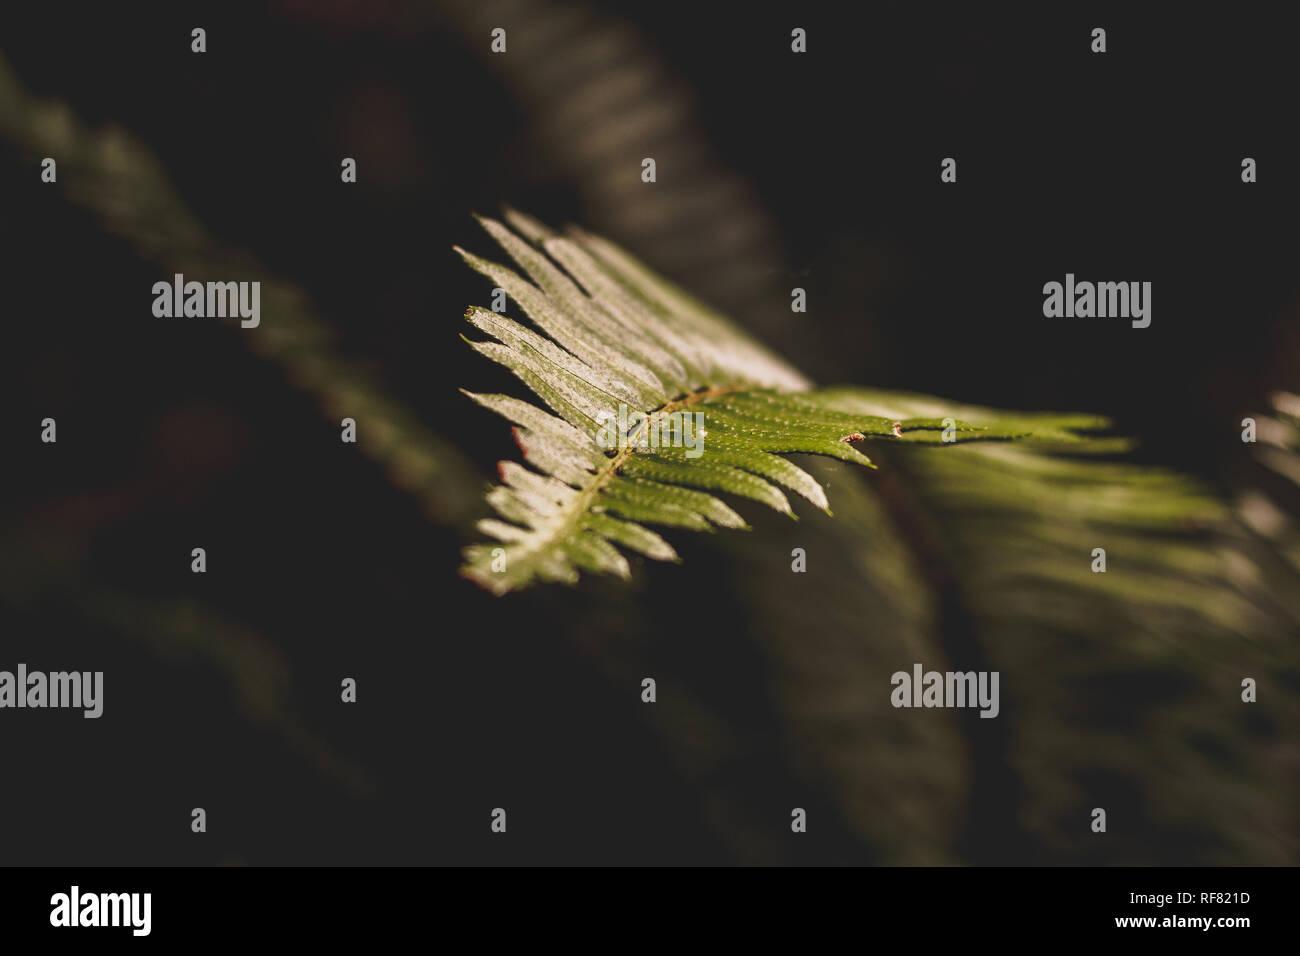 Fern Leaf against dark background in Muir Woods California - Stock Image